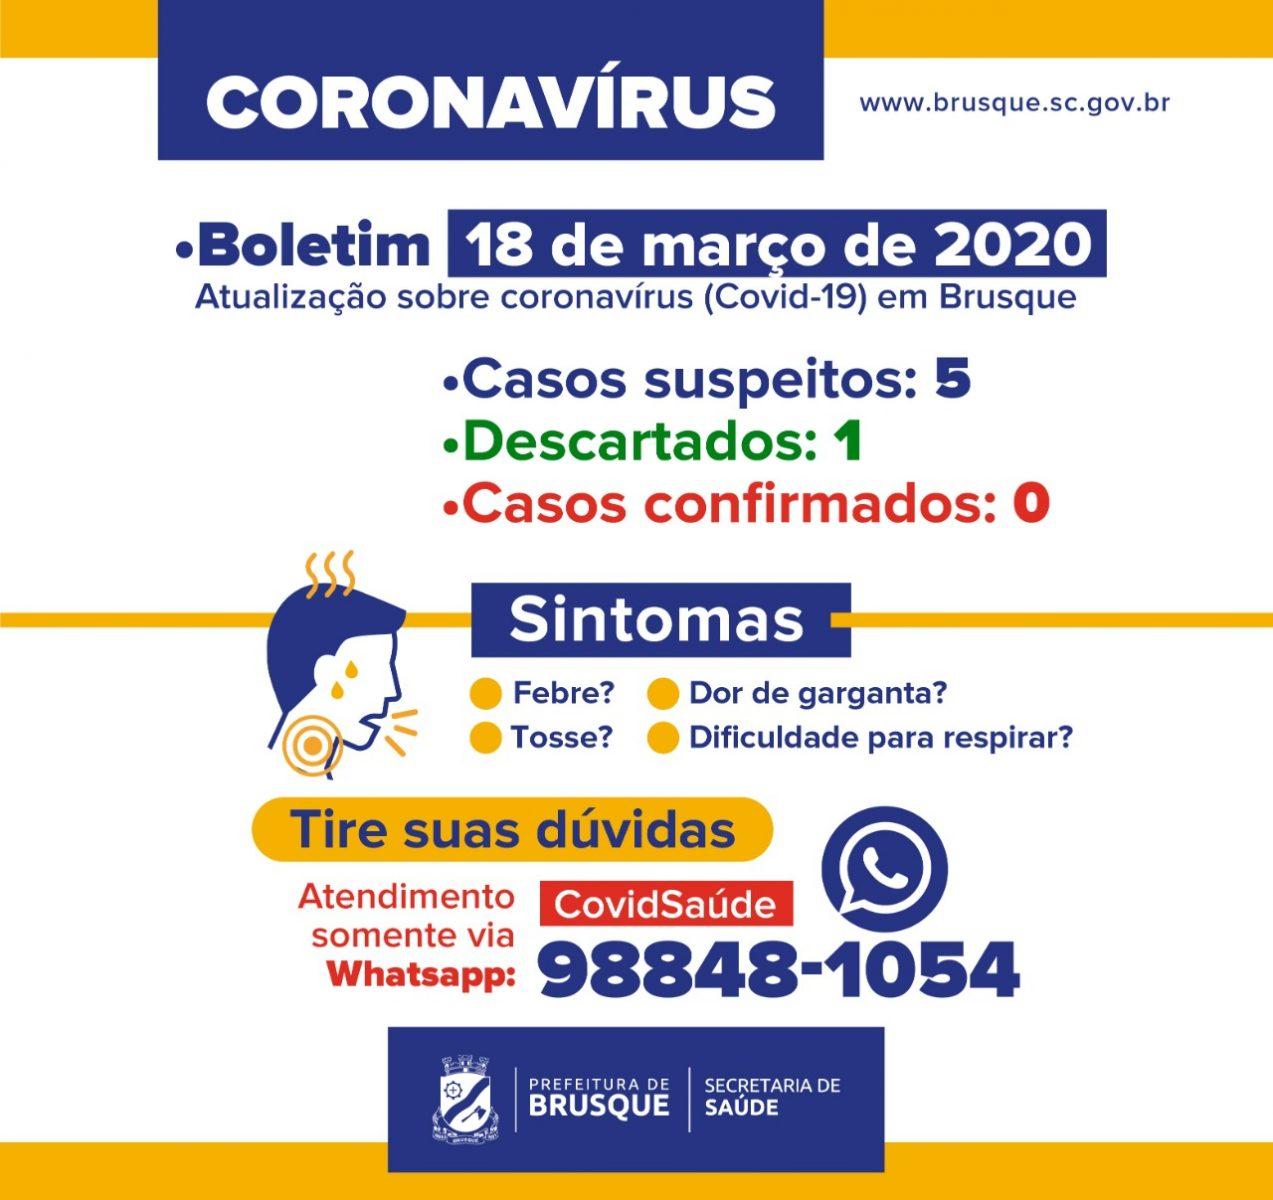 Infectologista esclarece dúvidas sobre coronavírus em webconferência